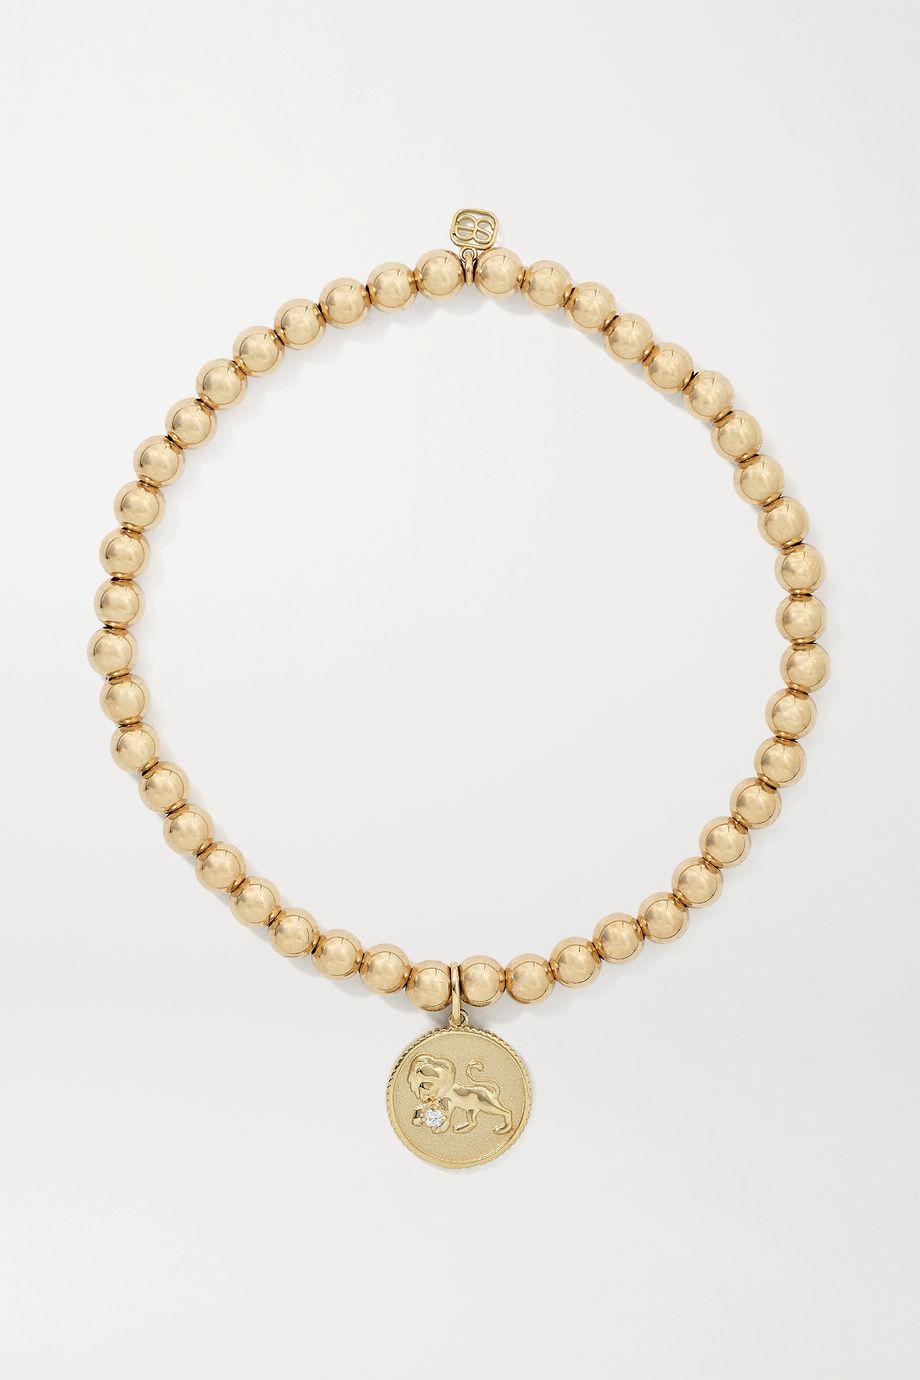 Sydney Evan Leo 14-karat gold diamond bracelet